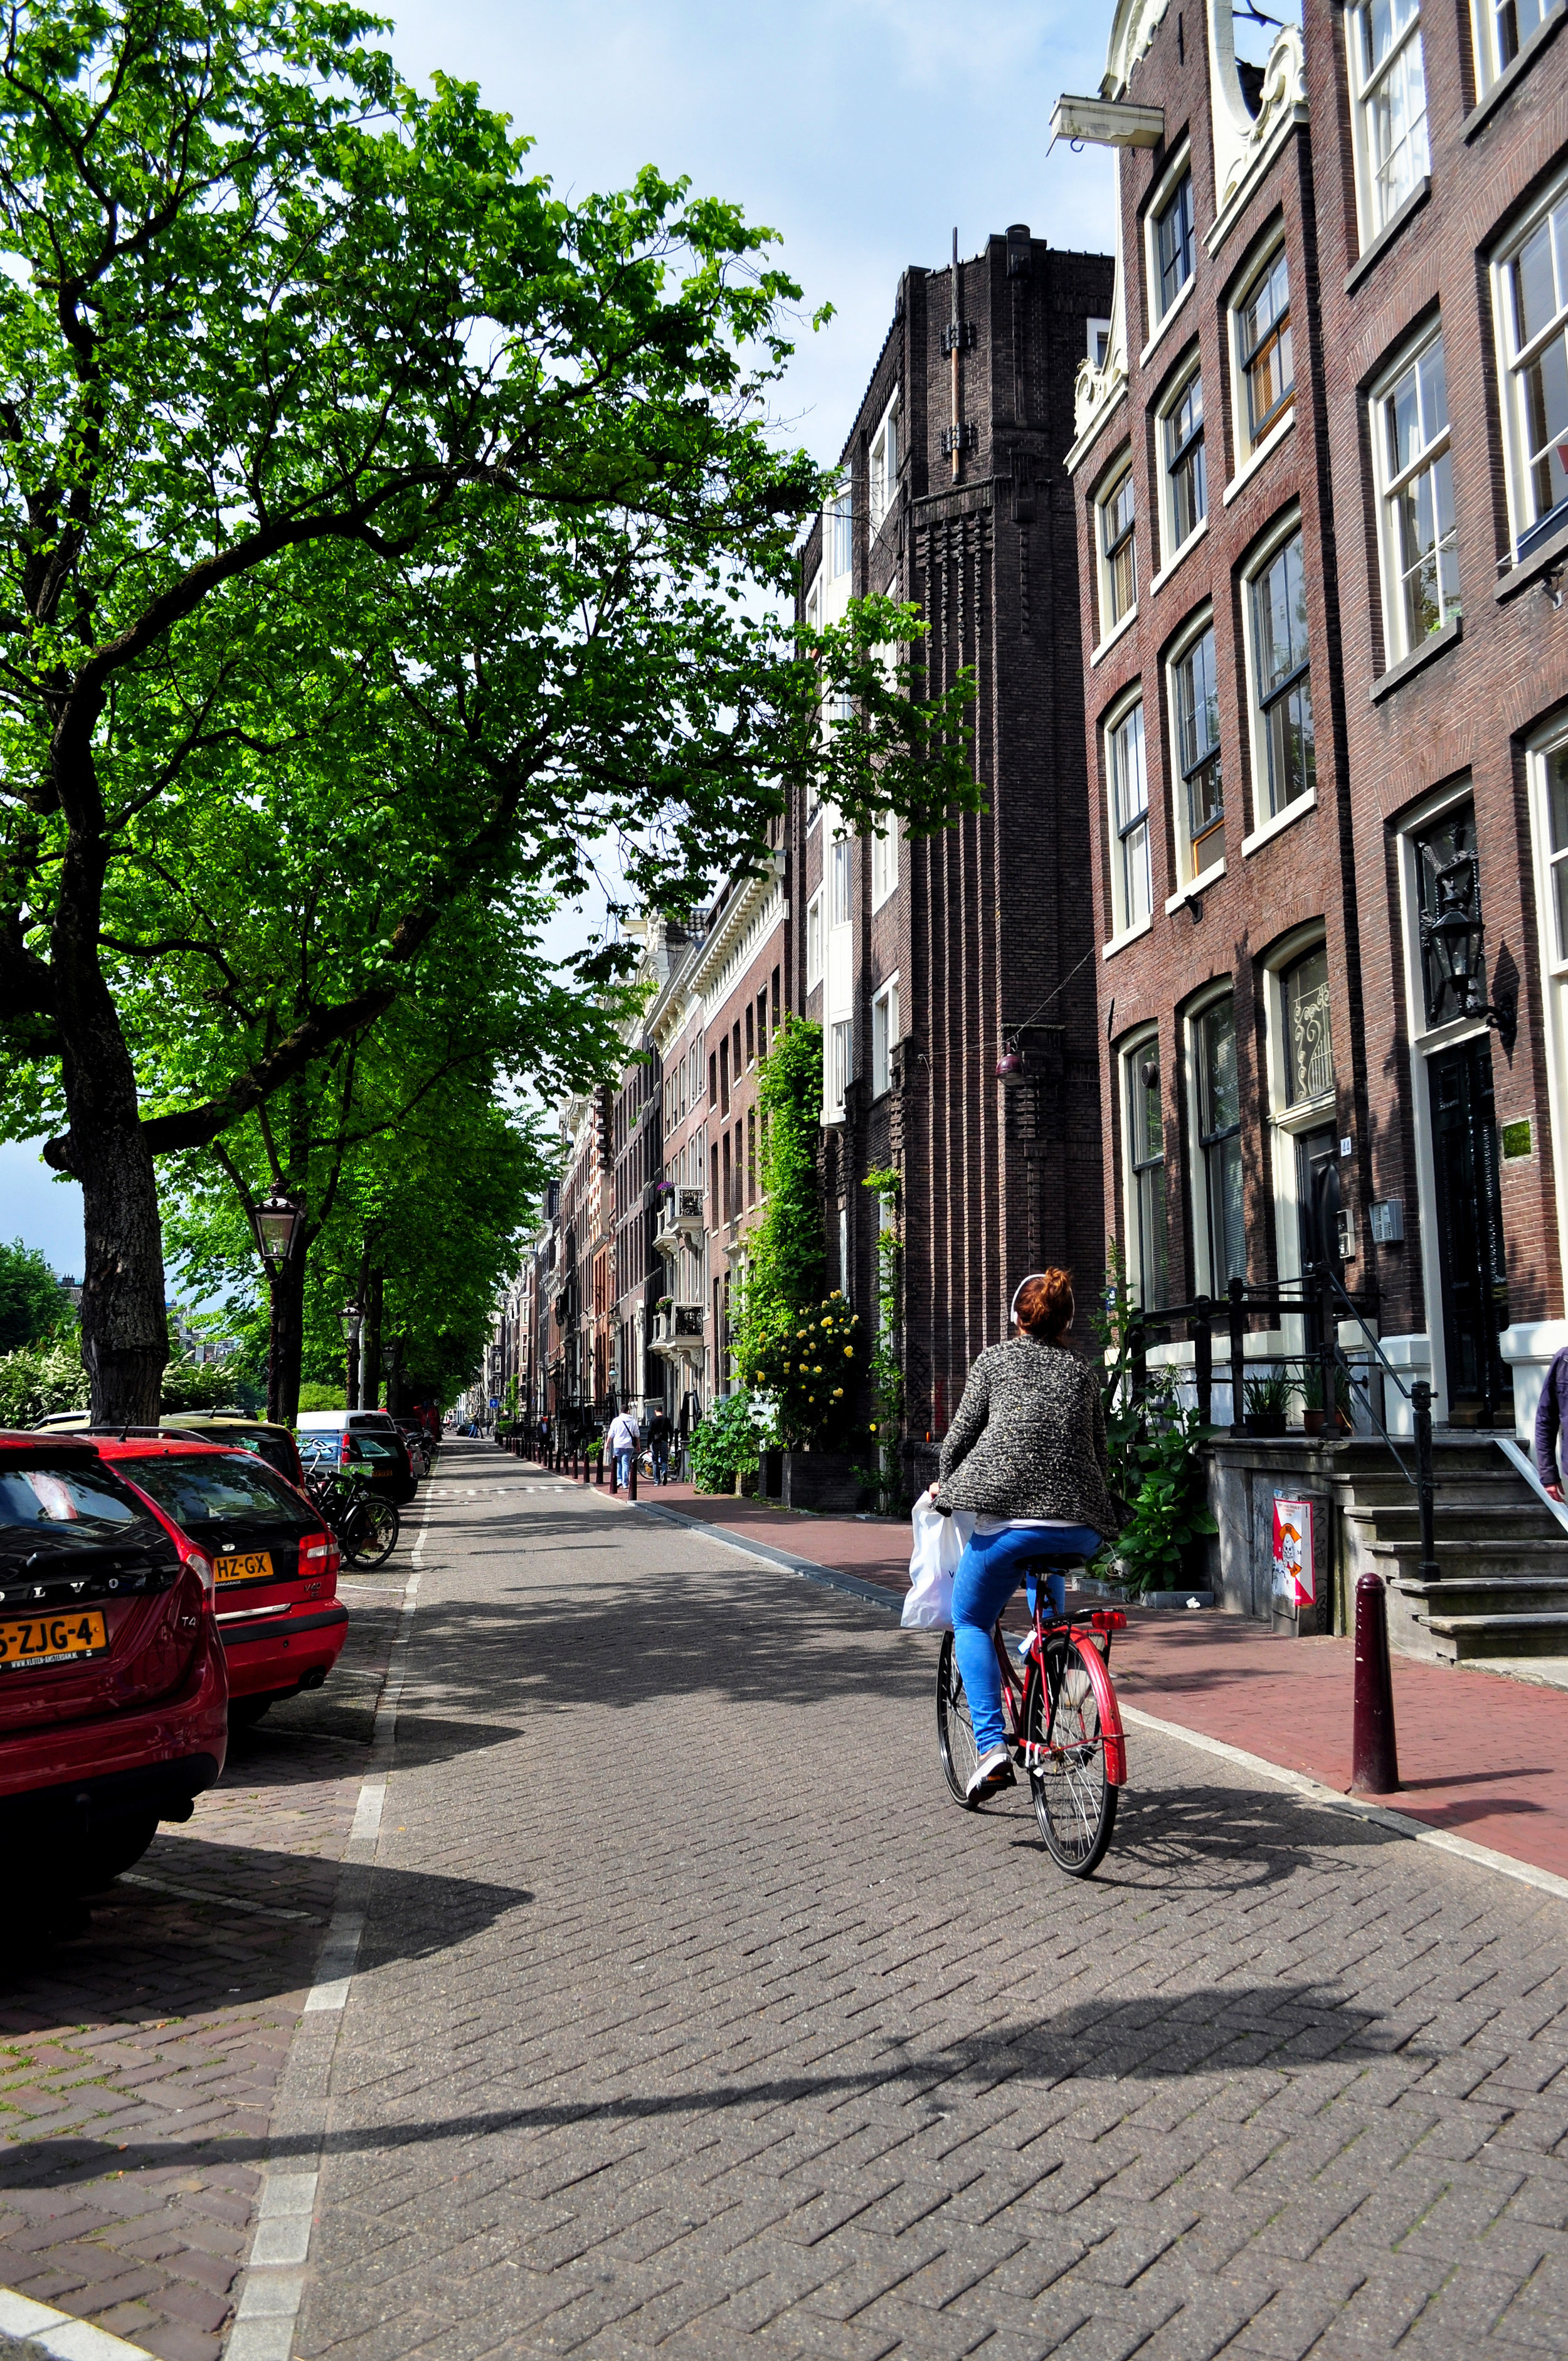 Calles de Amsterdam 2.JPG